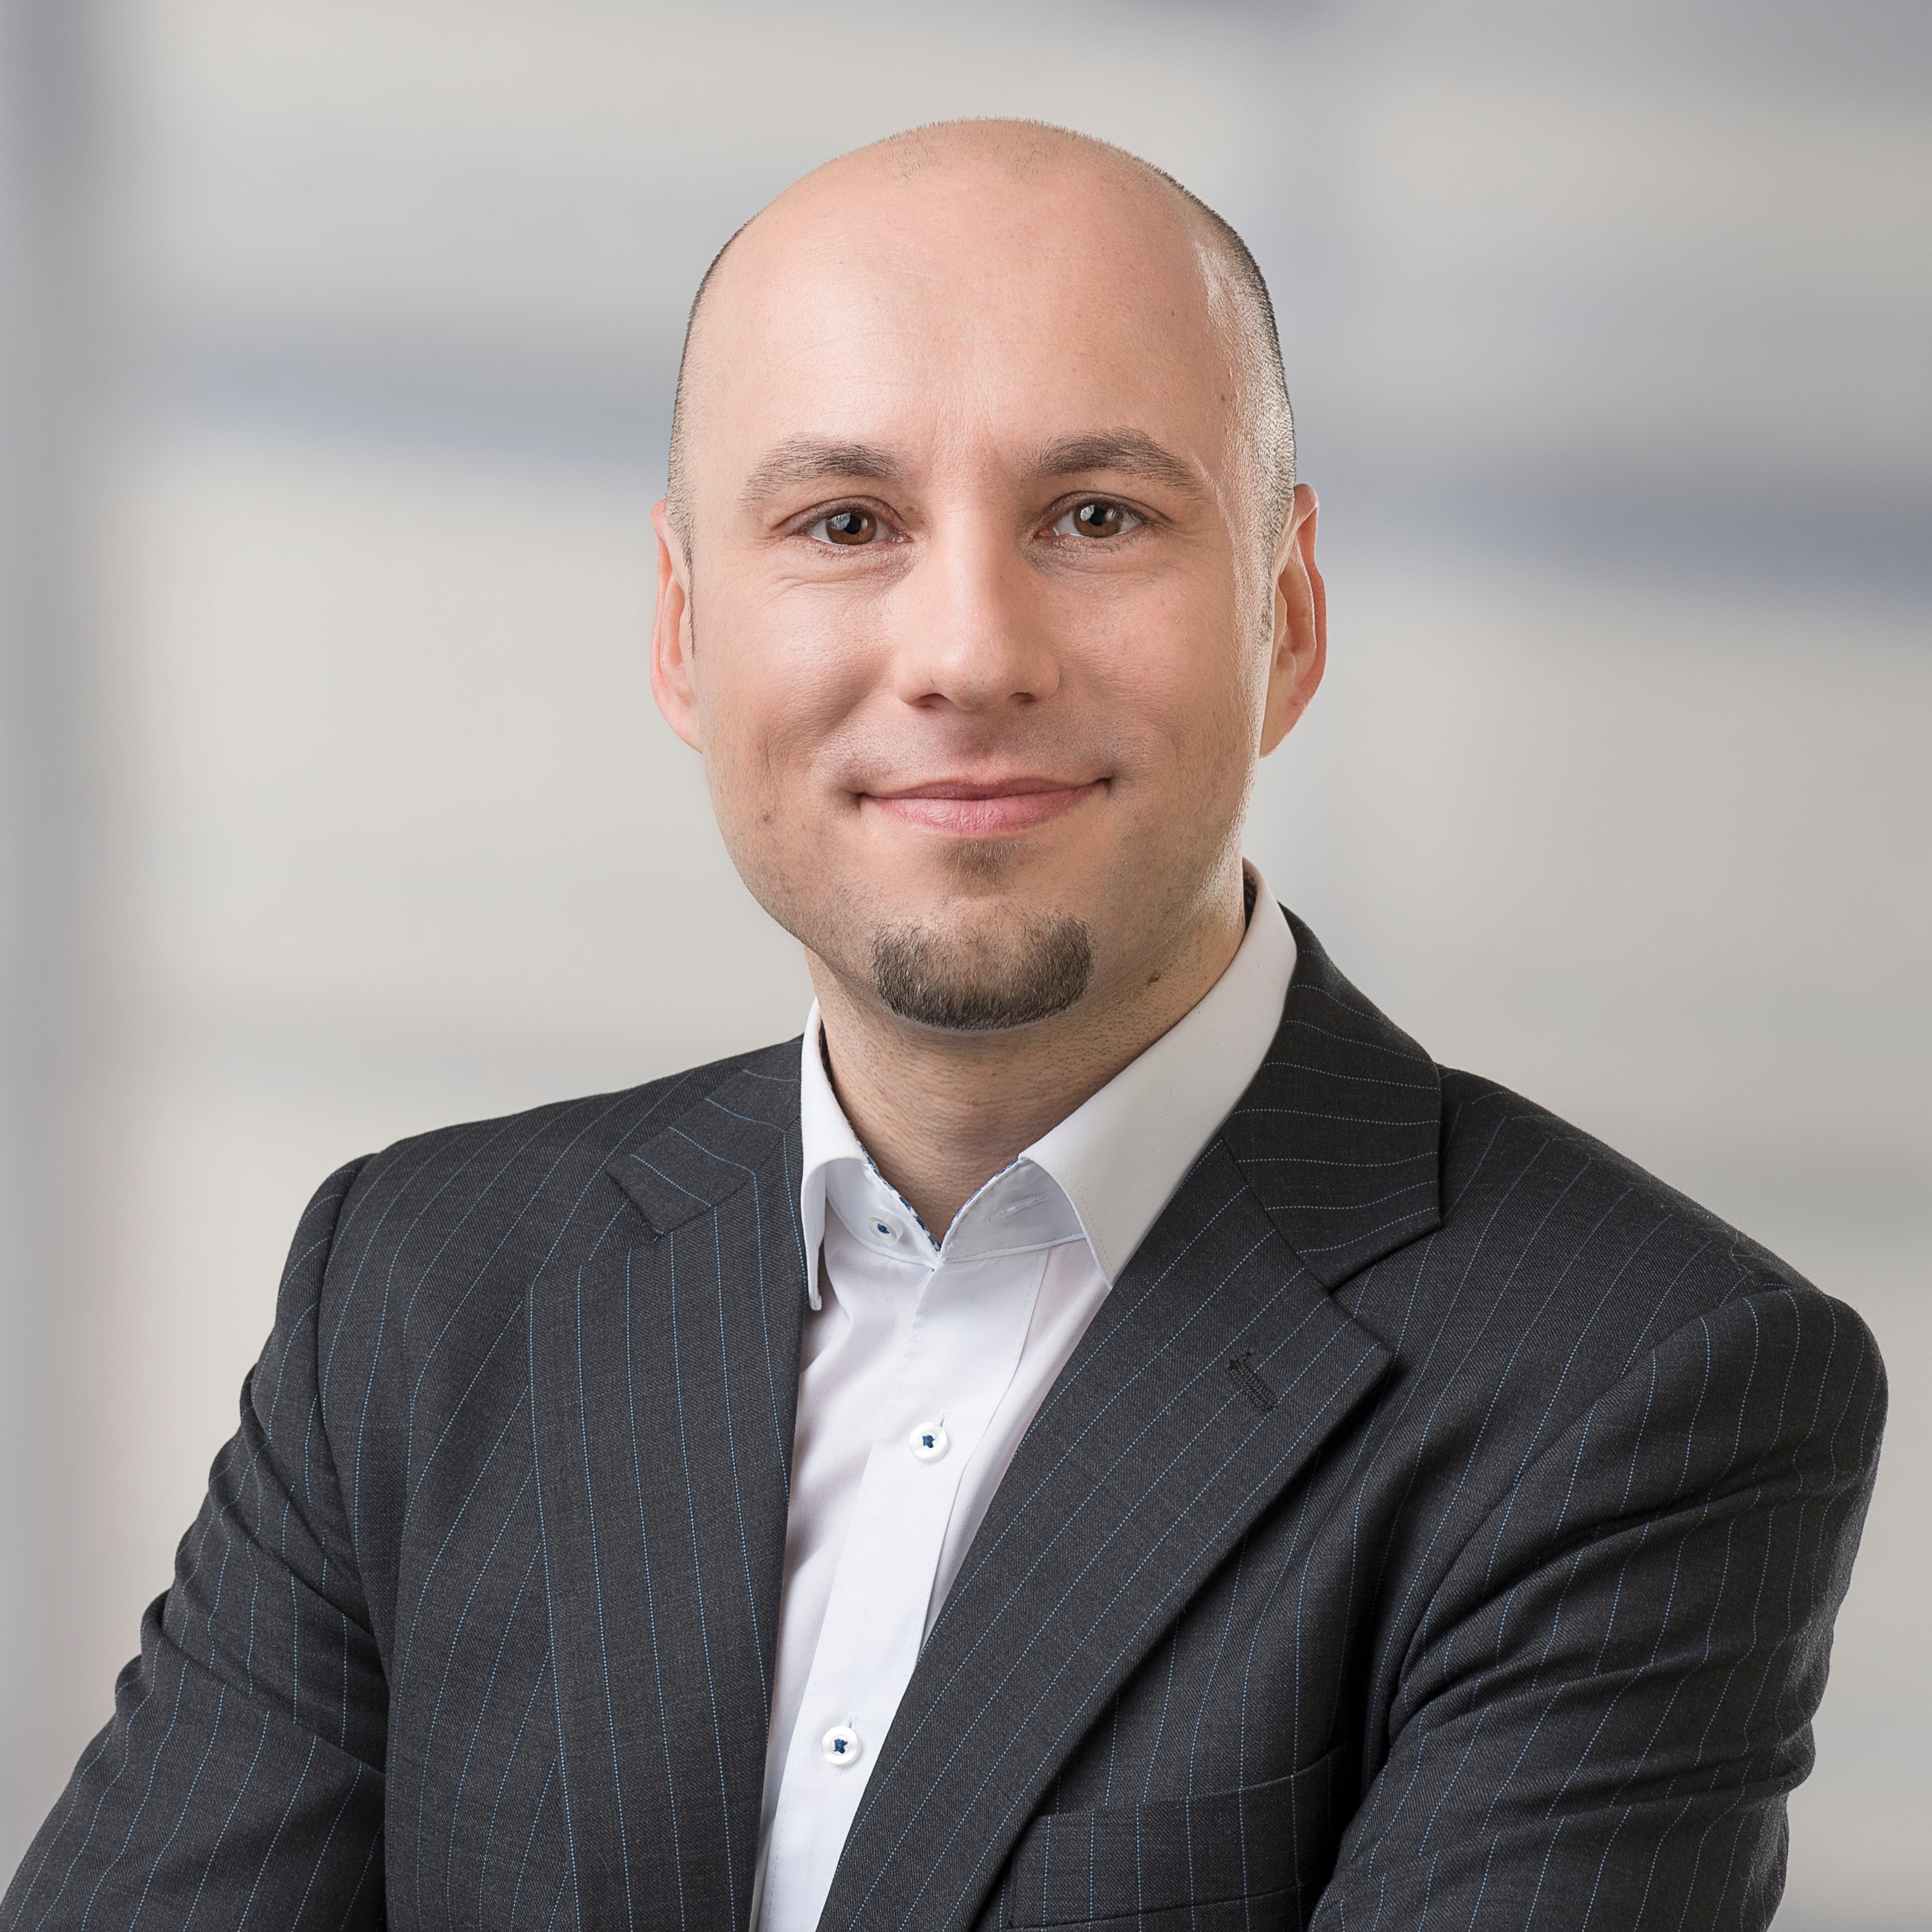 Coworker Christoph Ebersbach